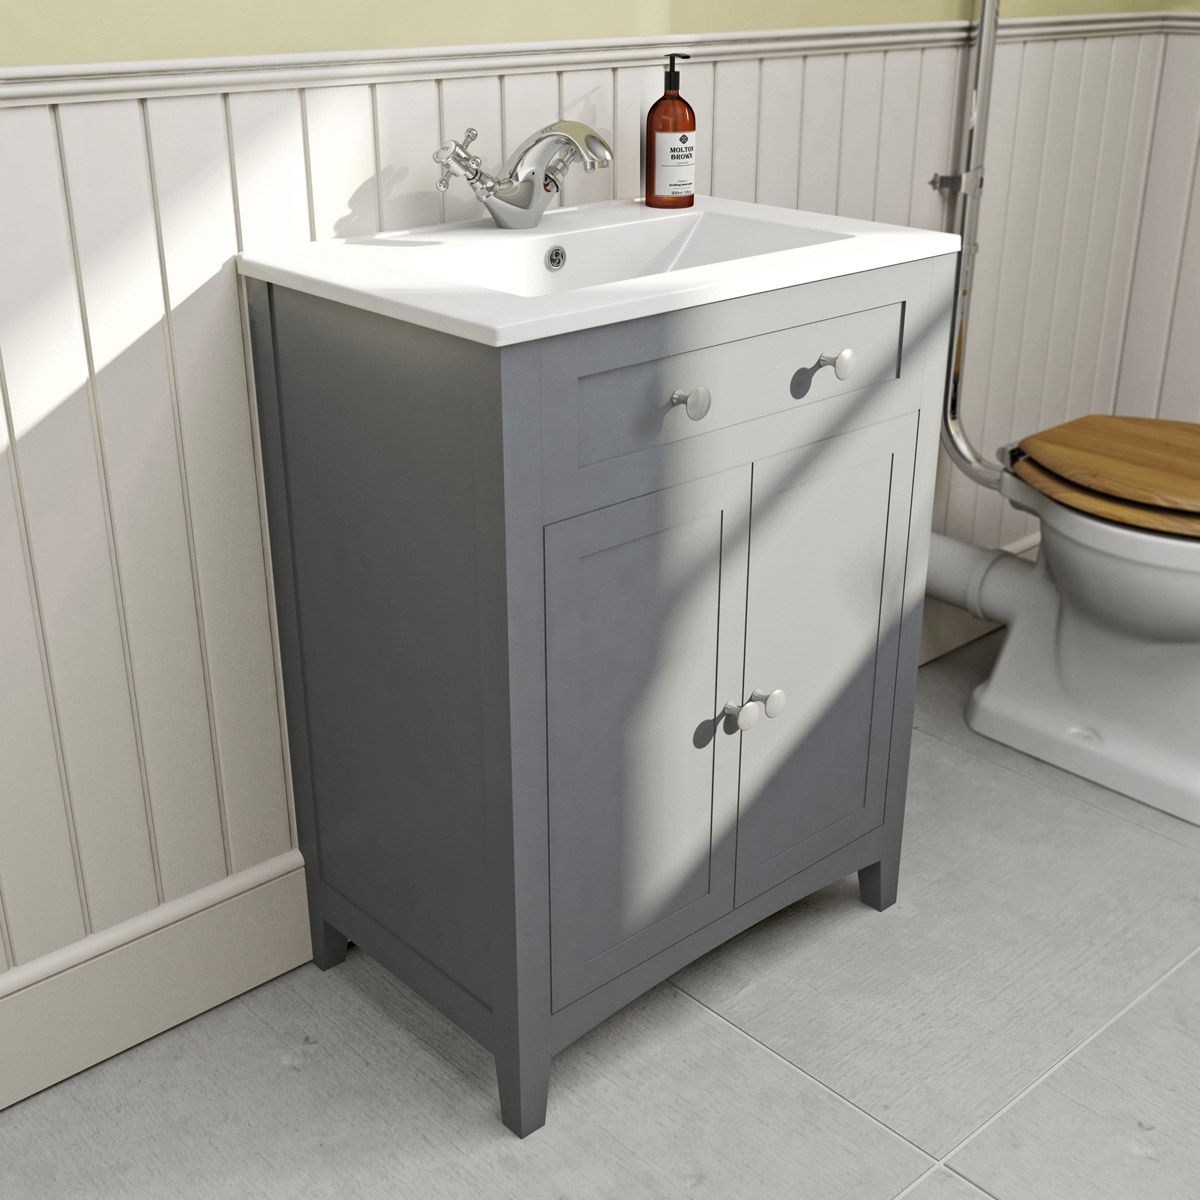 Vanity Unit With Basin Creative Ideas For The Bathroom